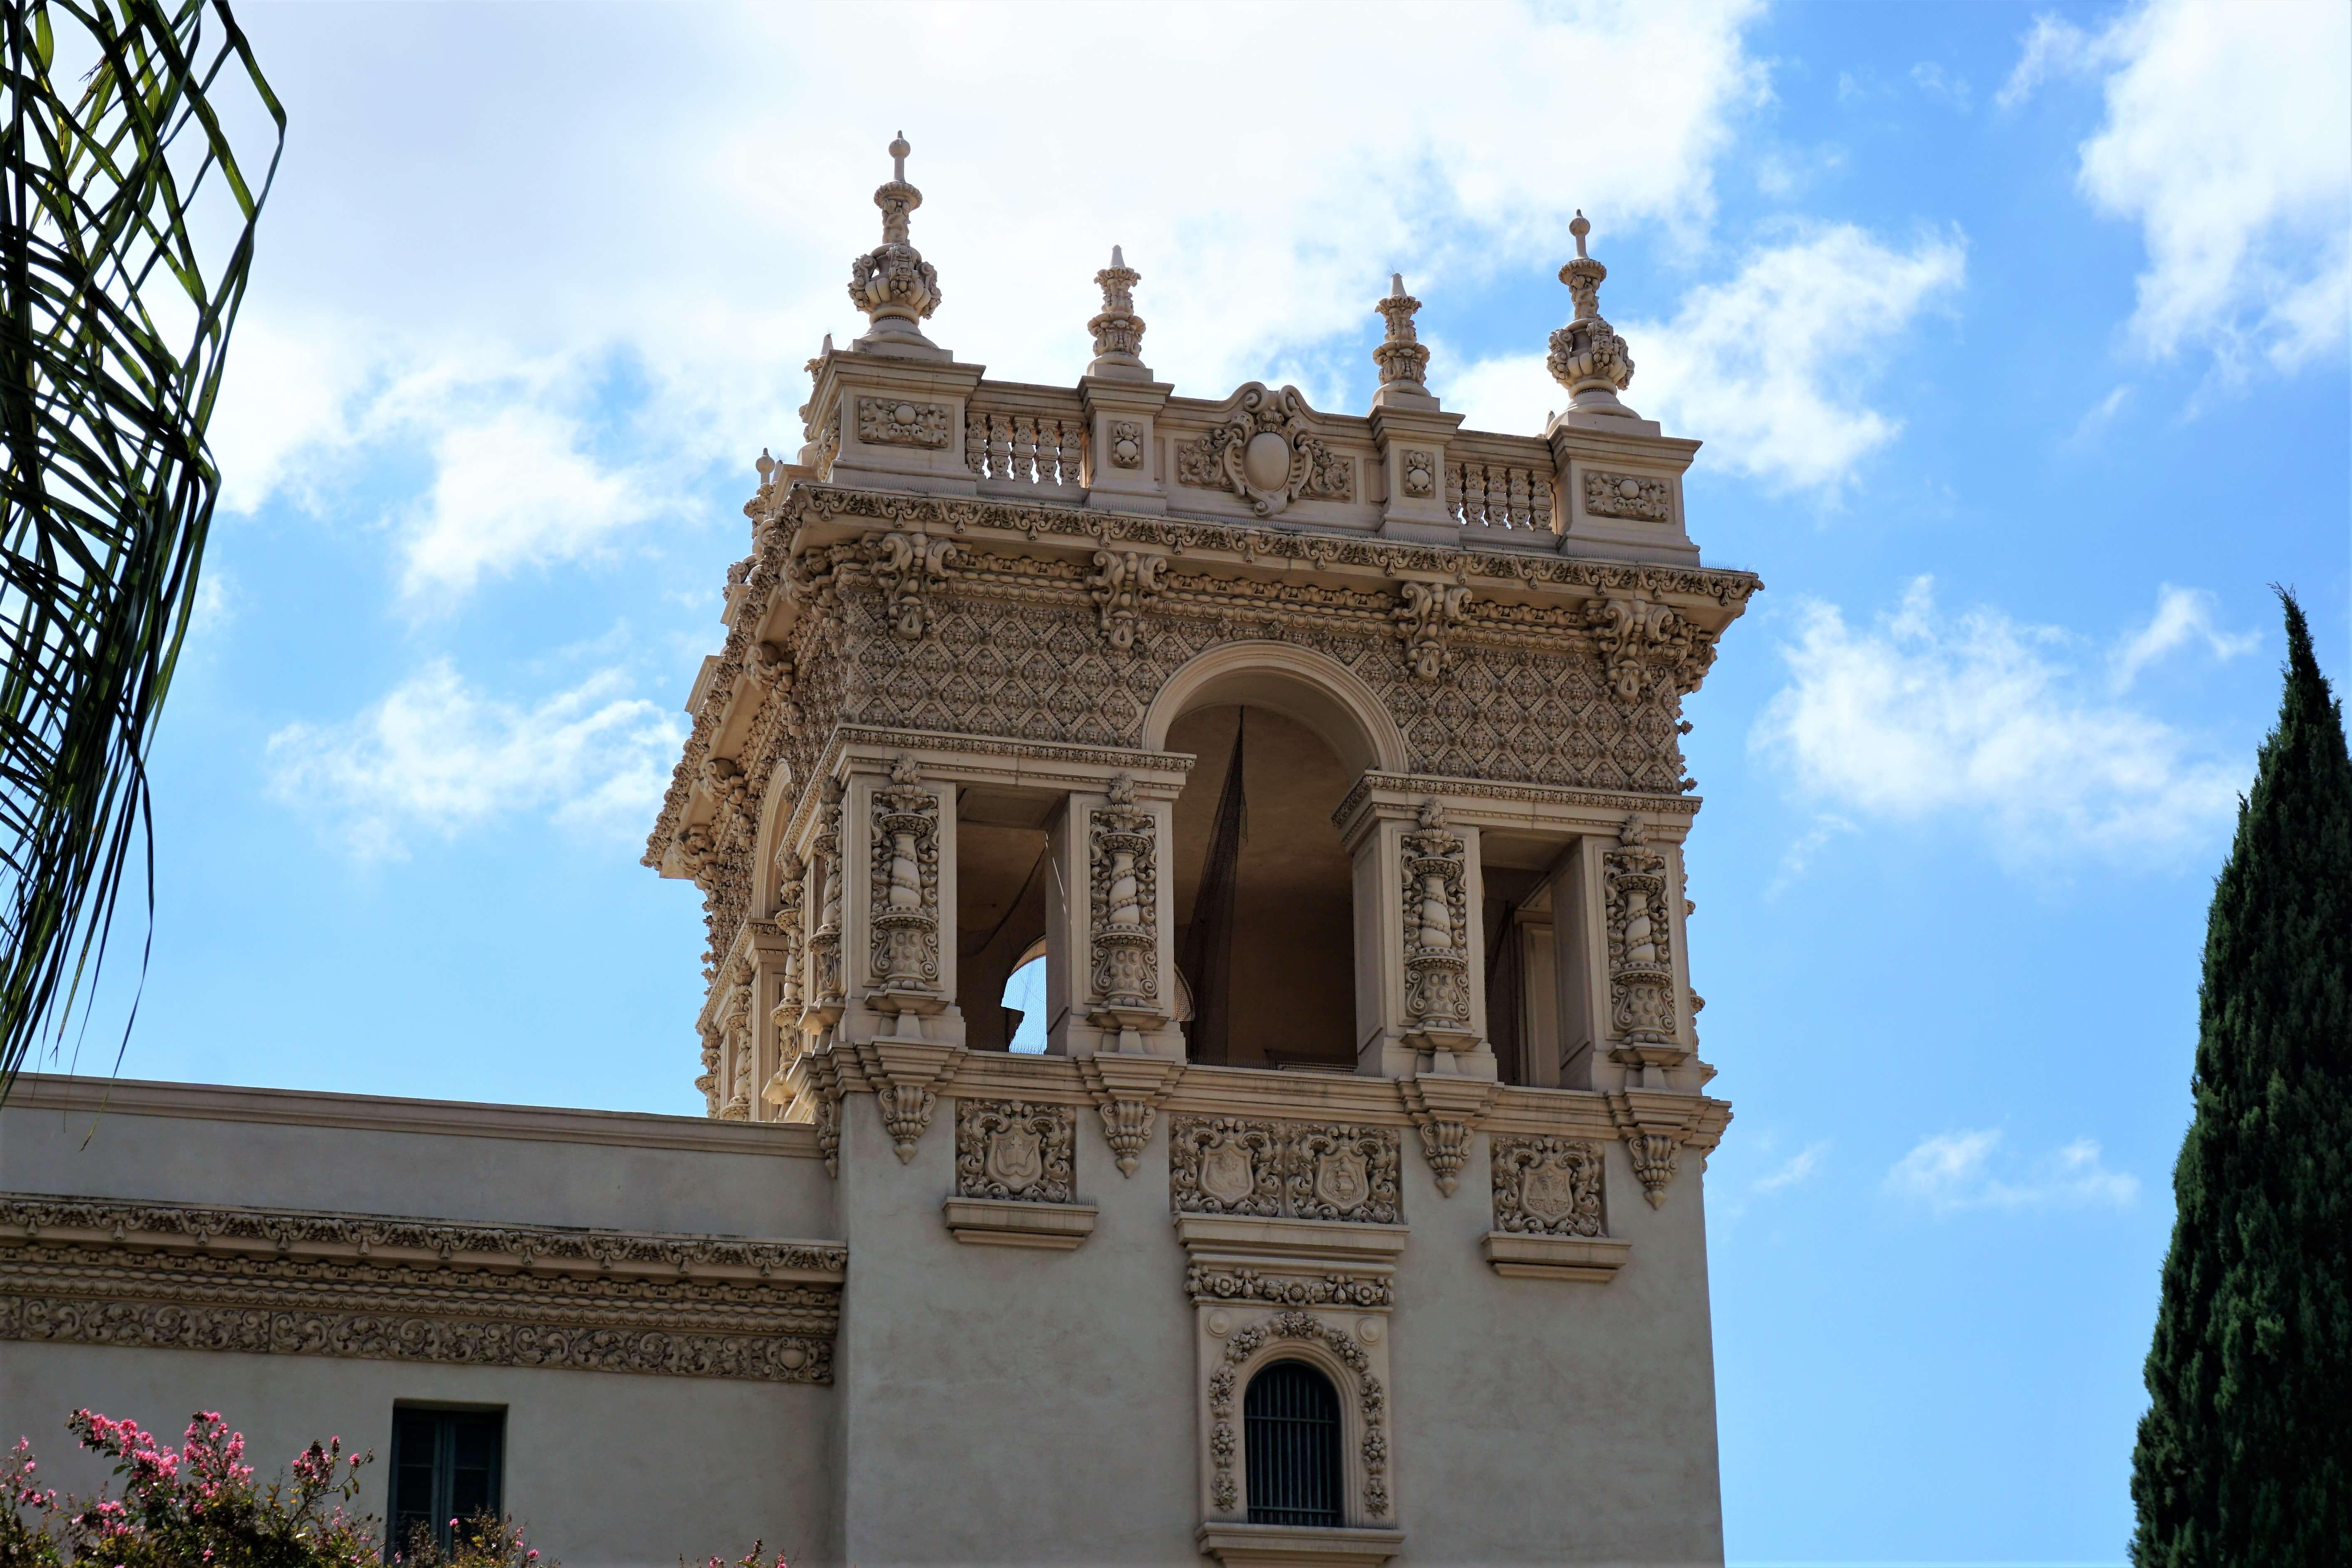 Spanish Renaissance building along El Prado in Balboa Park